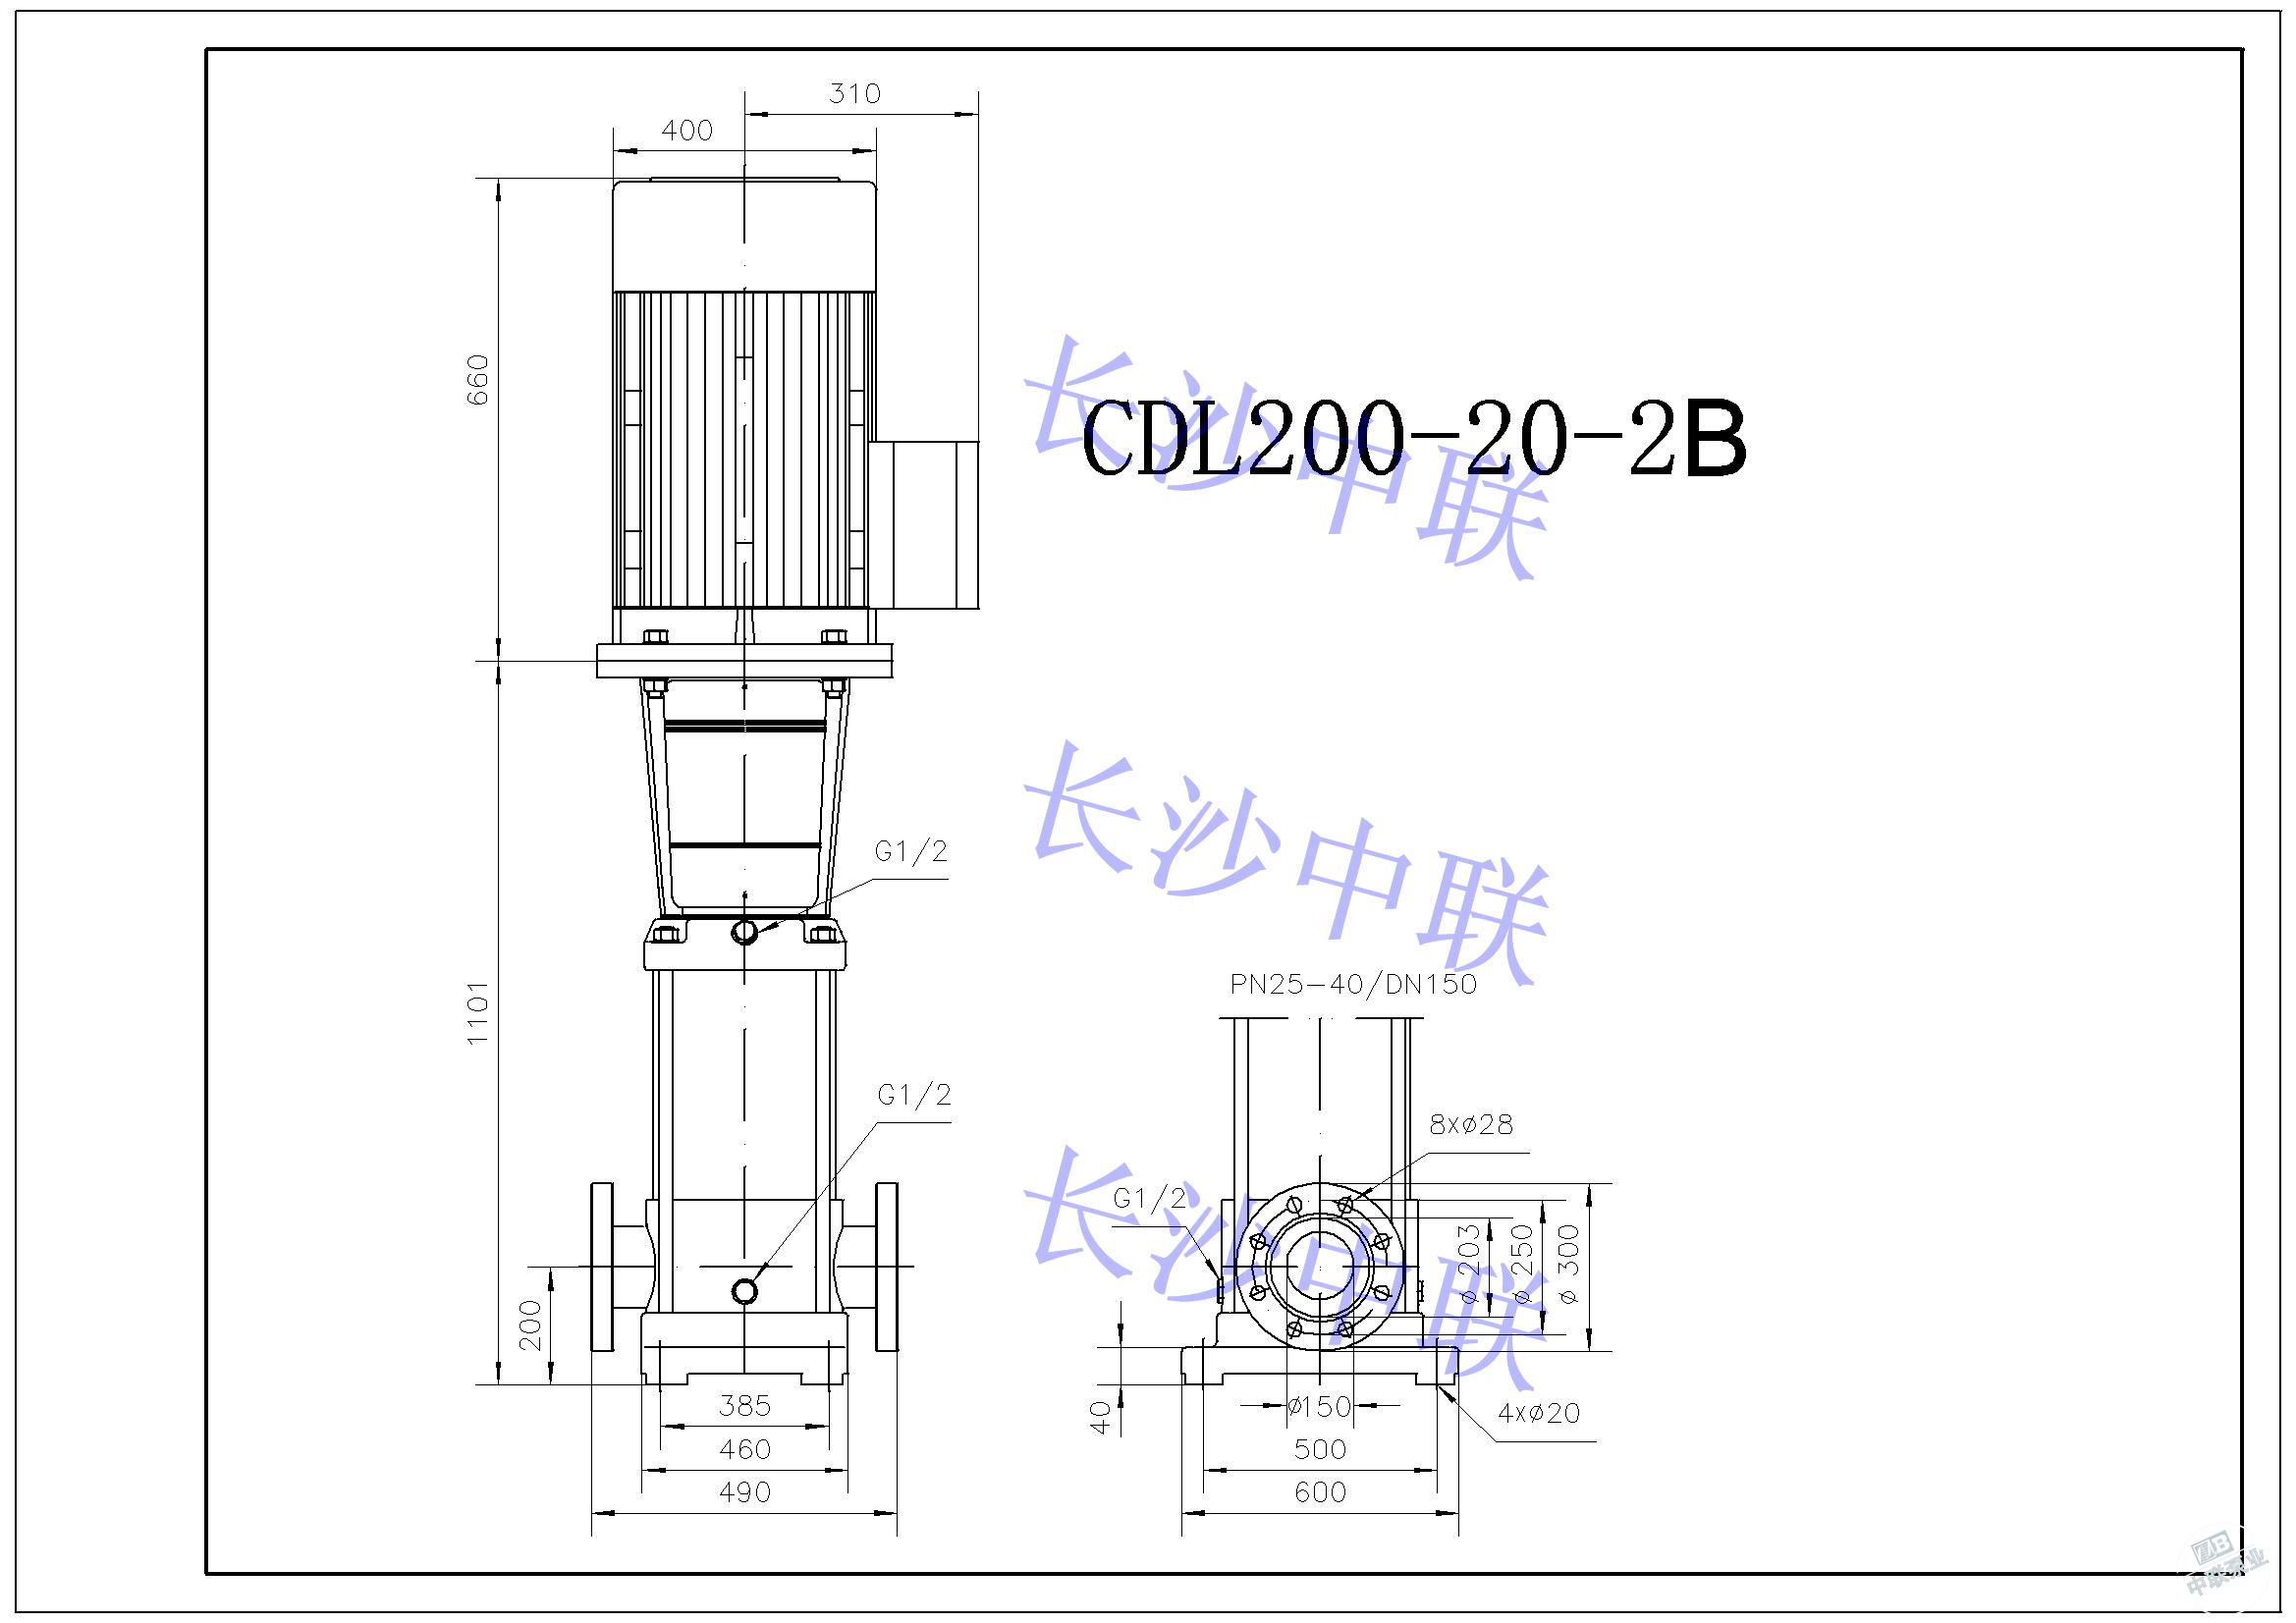 CDL200-20-2B multi-stage pump installation drawing